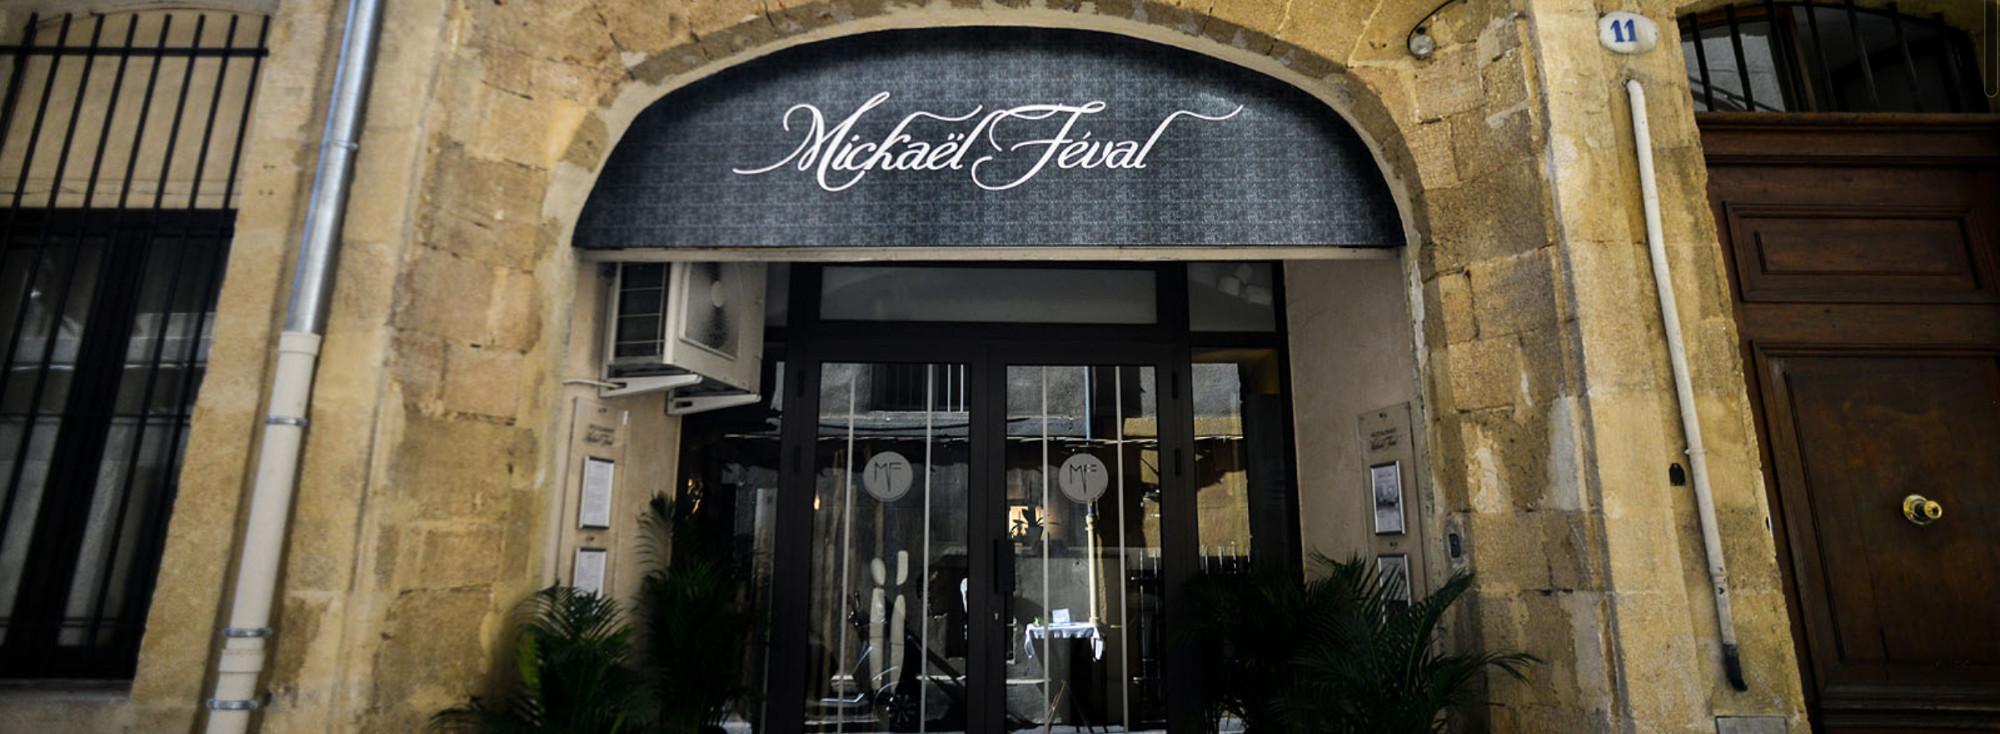 Restaurant Mickaël Féval Aix en Provence - Restaurant - Aix en Provence